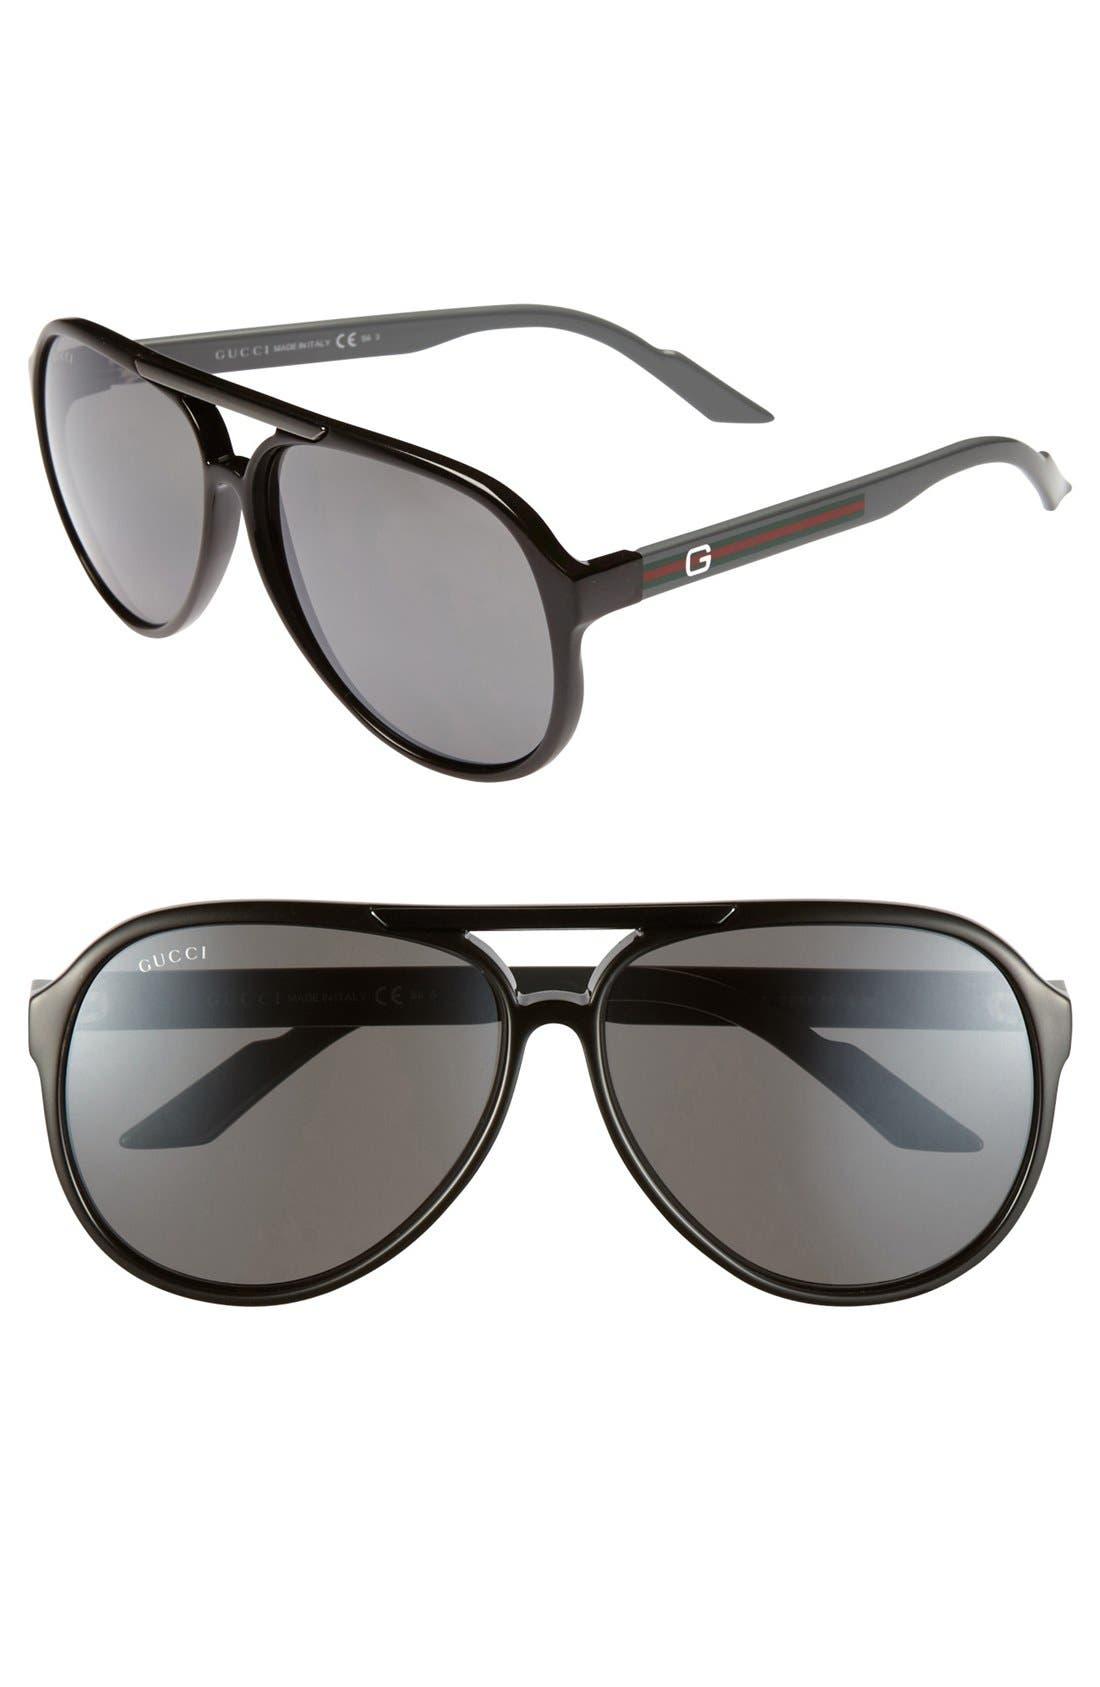 Main Image - Gucci '1627/S' 59mm Aviator Sunglasses